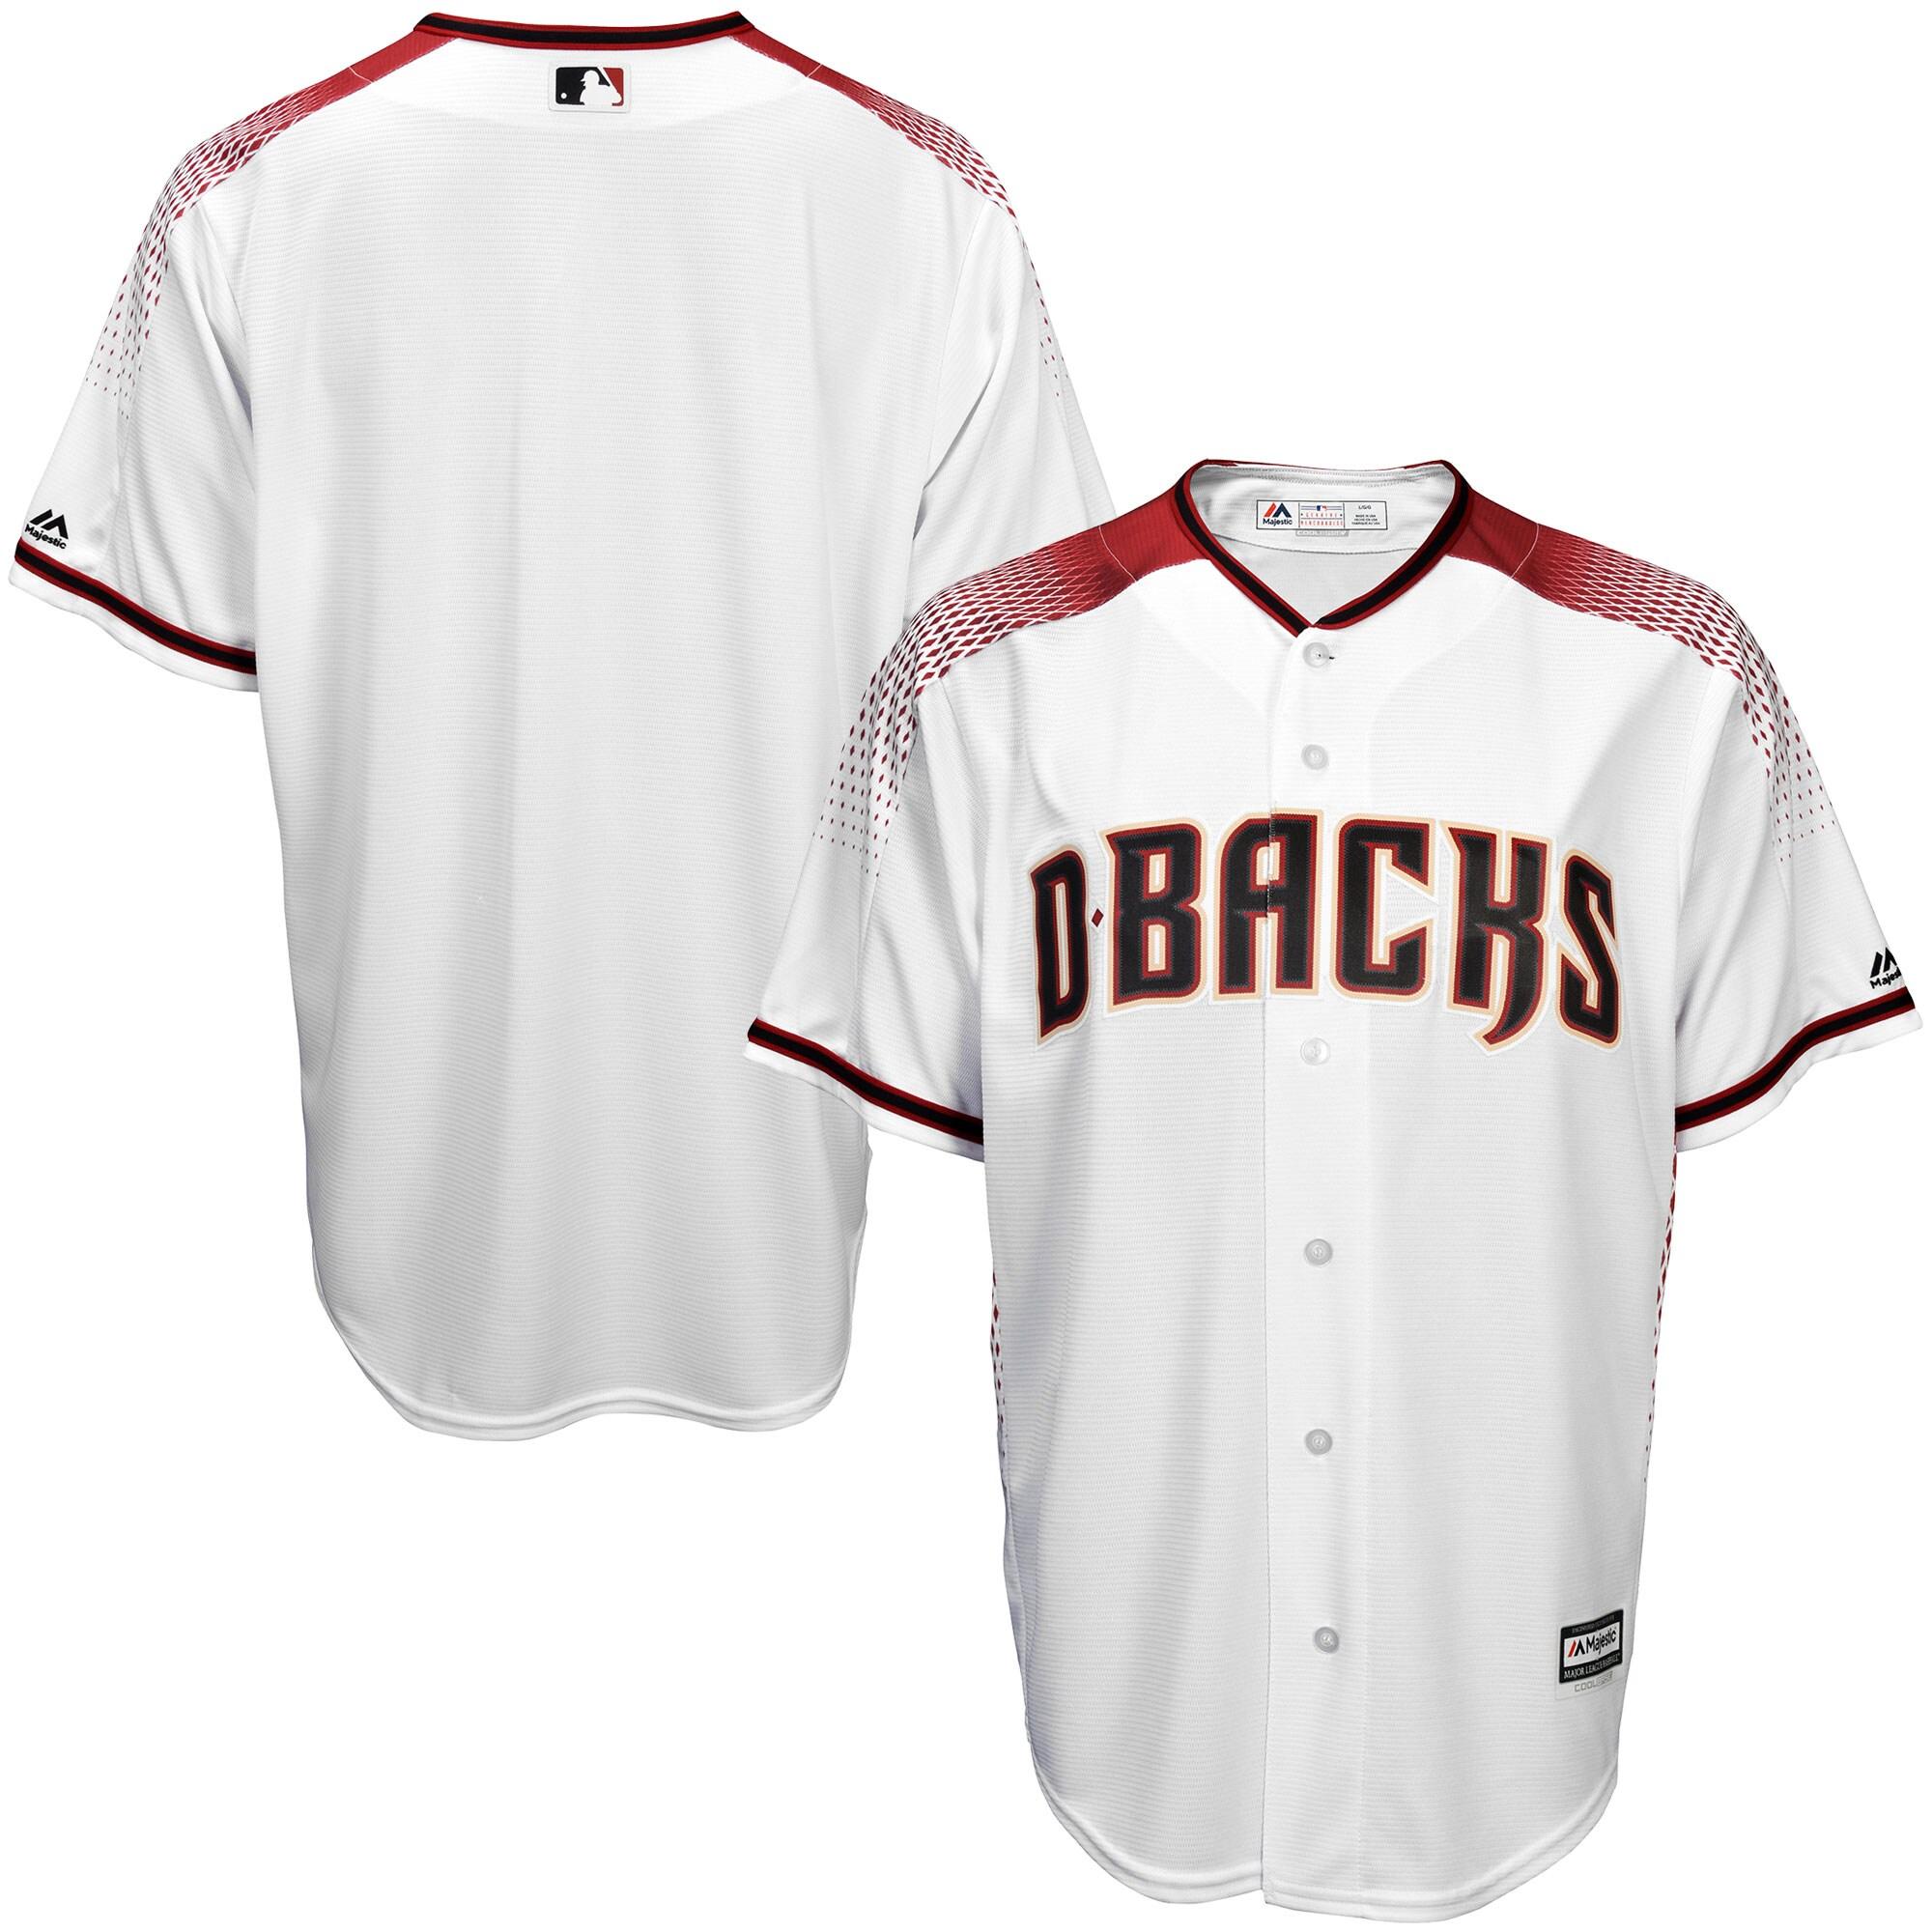 Arizona Diamondbacks Majestic Youth Offical Cool Base Jersey - White/Sedona Red